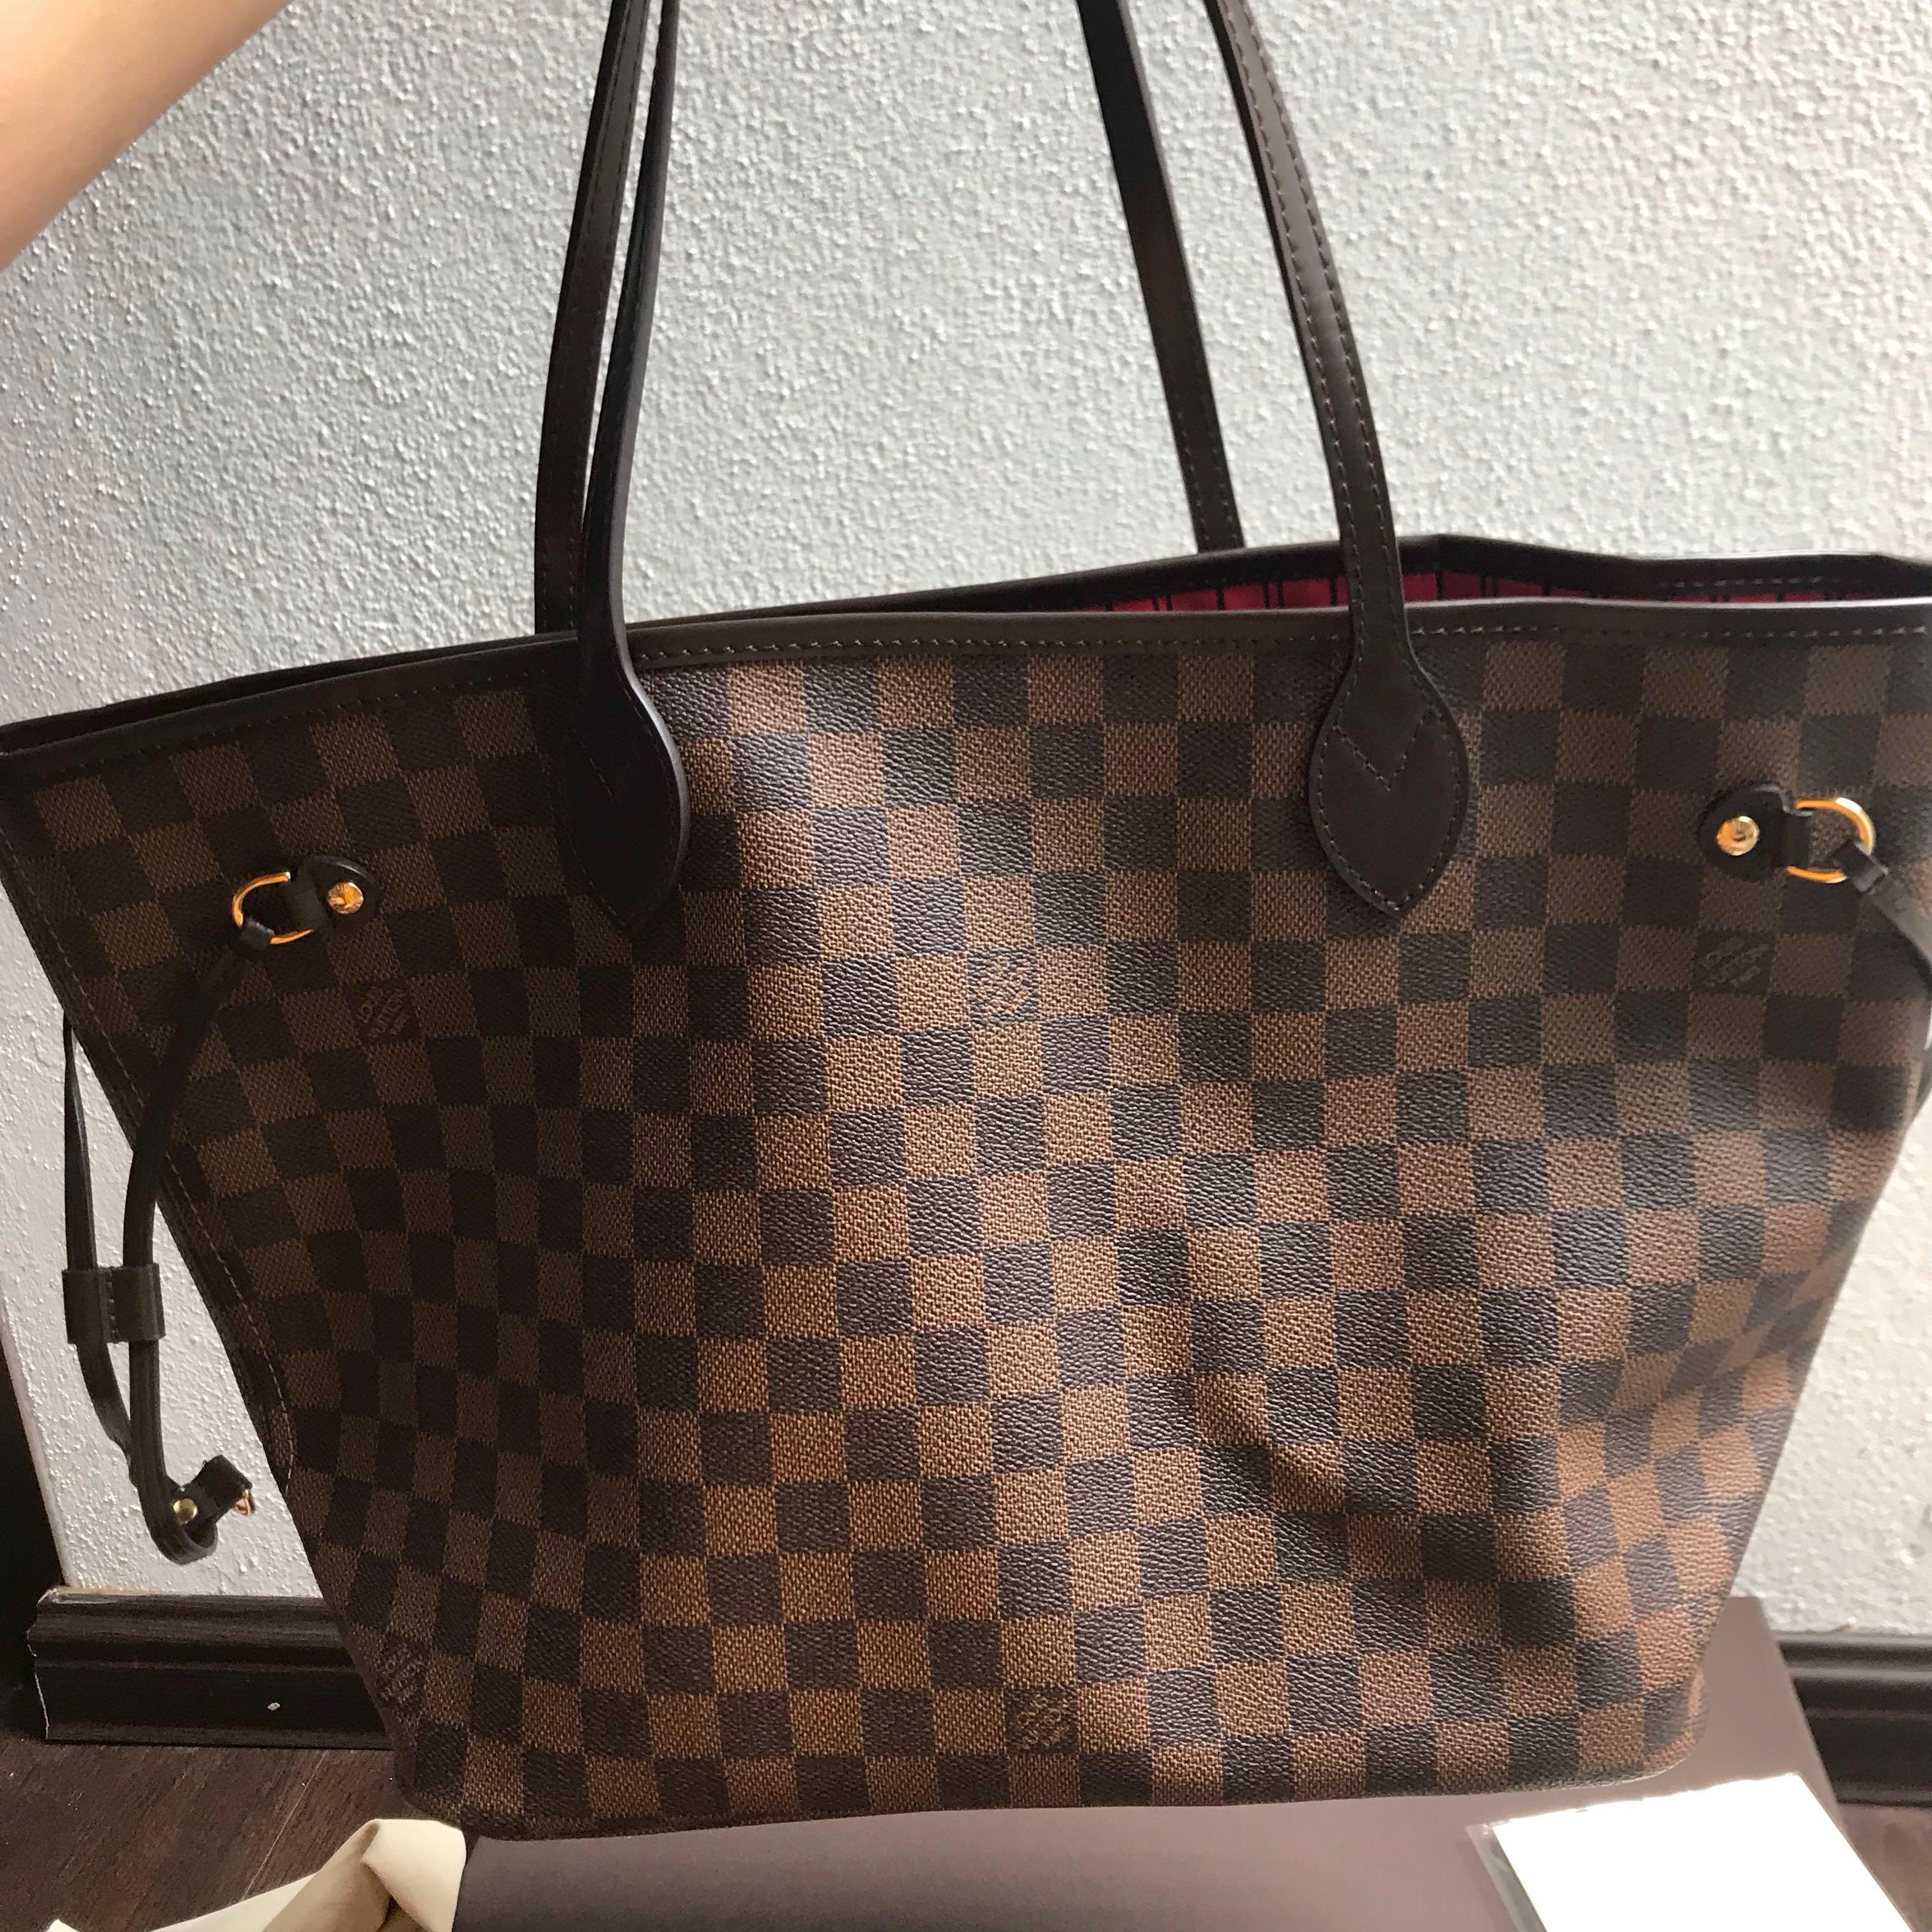 5fef1a806 Louis Vuitton Neverfull PM (triple AAA replica), Women's Fashion ...